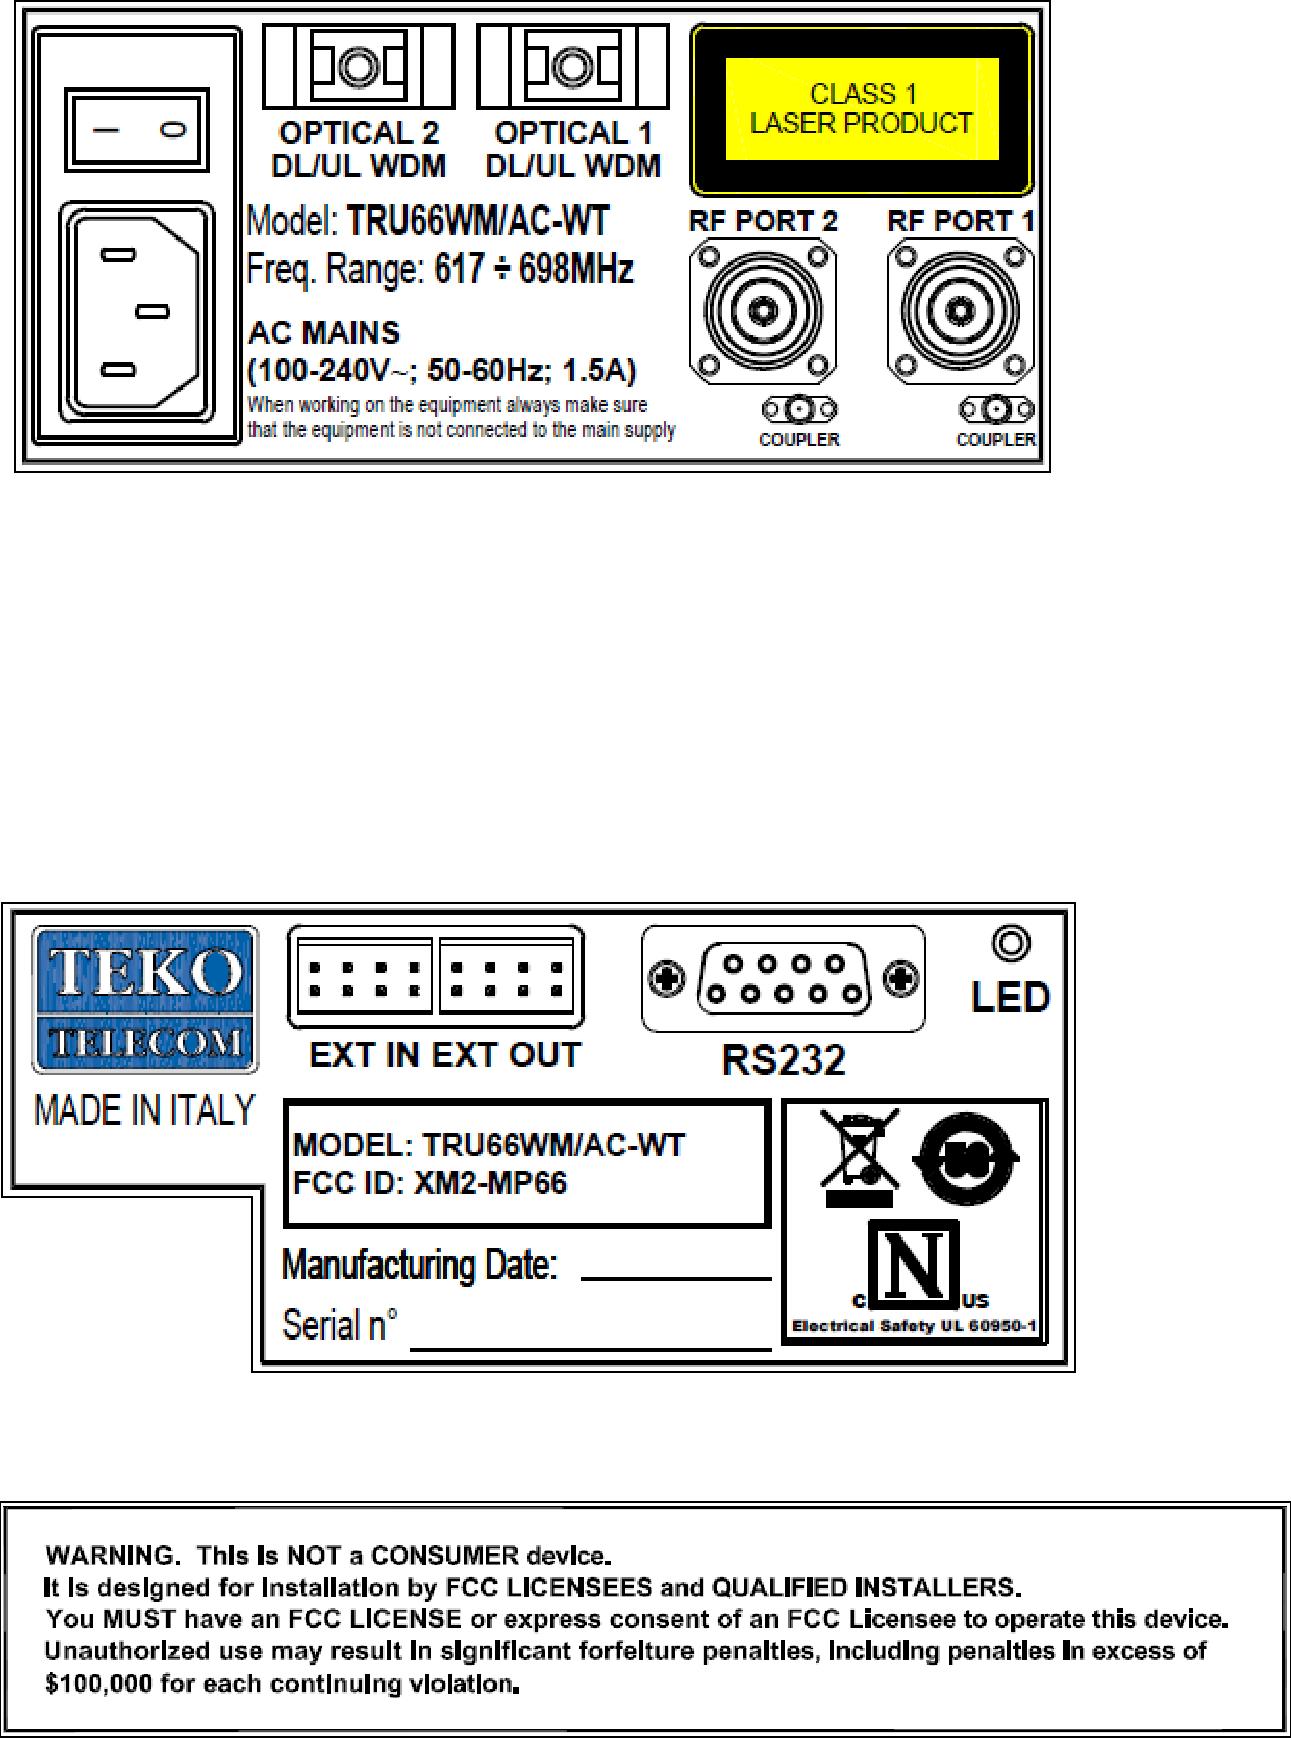 Teko Telecom Srl Remote Unit Medium Power MP66 (XM2-MP66